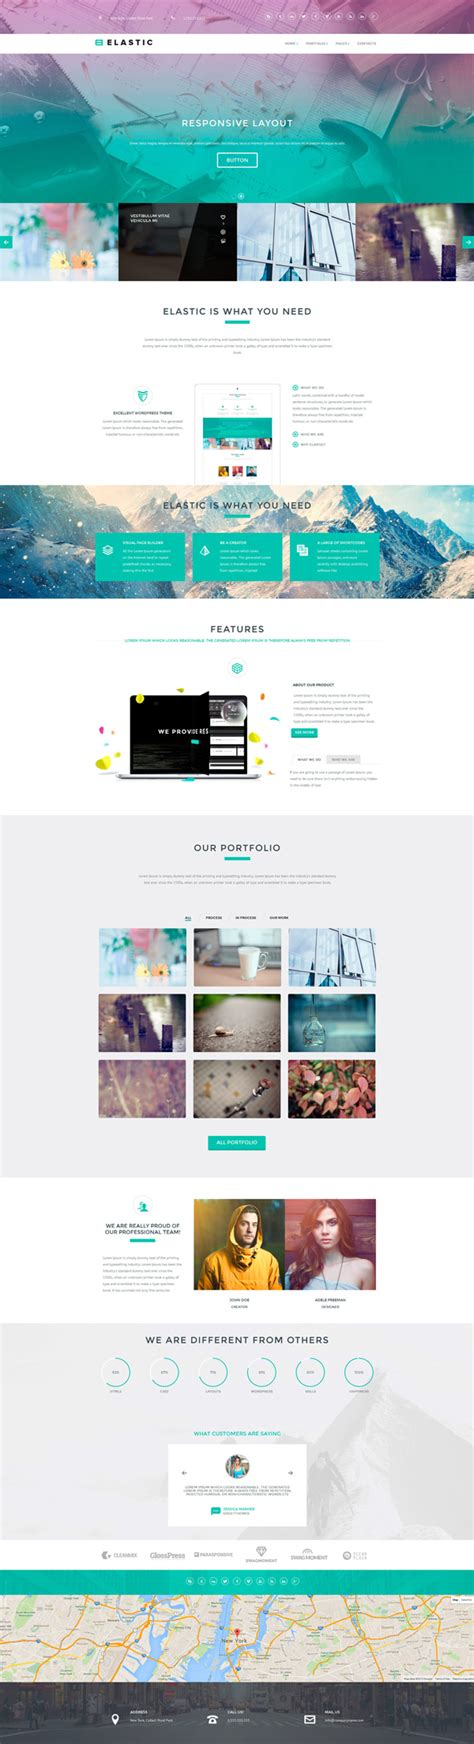 wordpress themes grafik design modern responsive wordpress themes wordpress themes